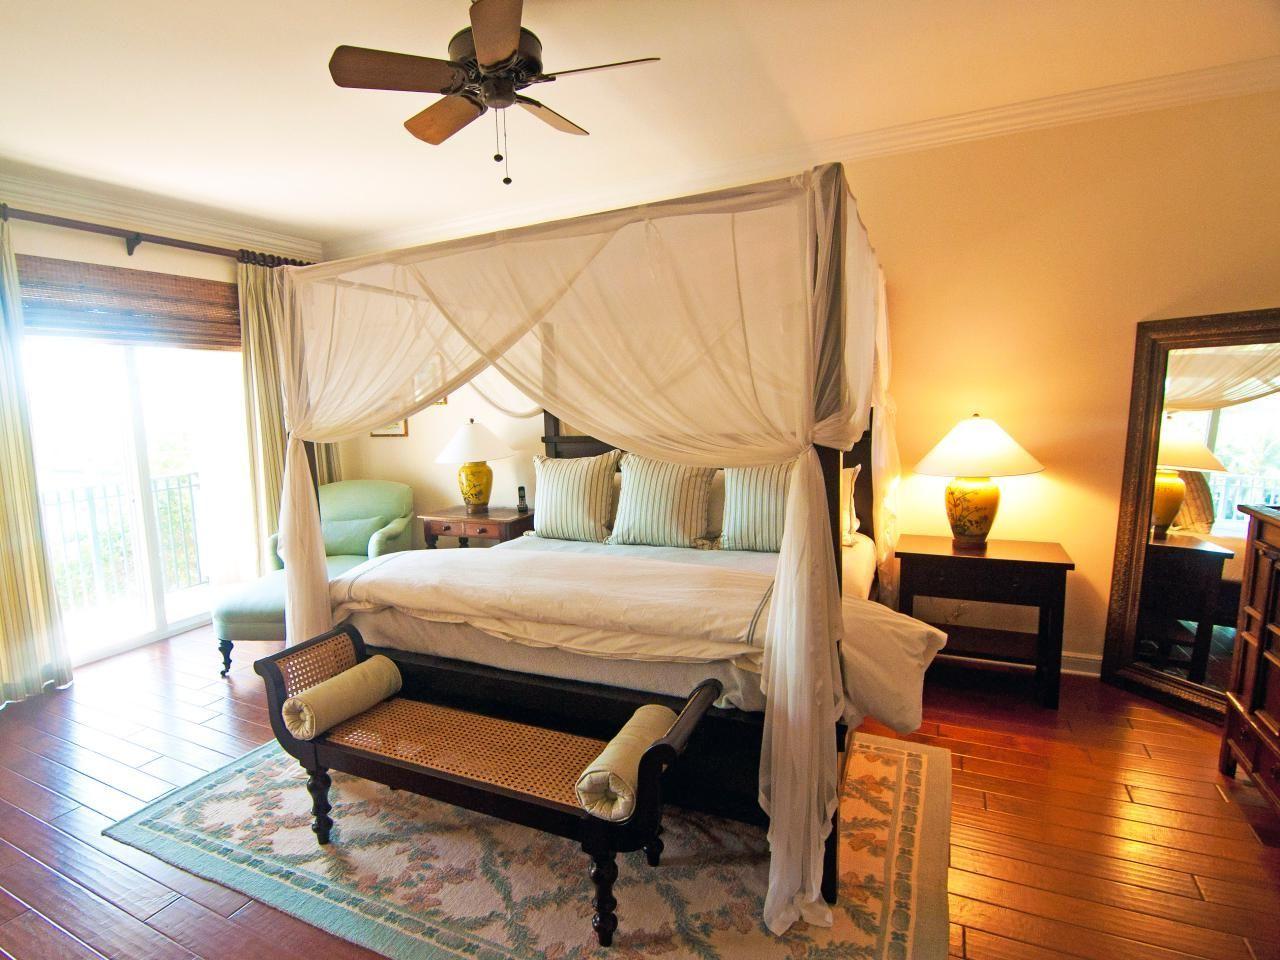 british west indies furniture for your bedroom - British West Indies Interior Design